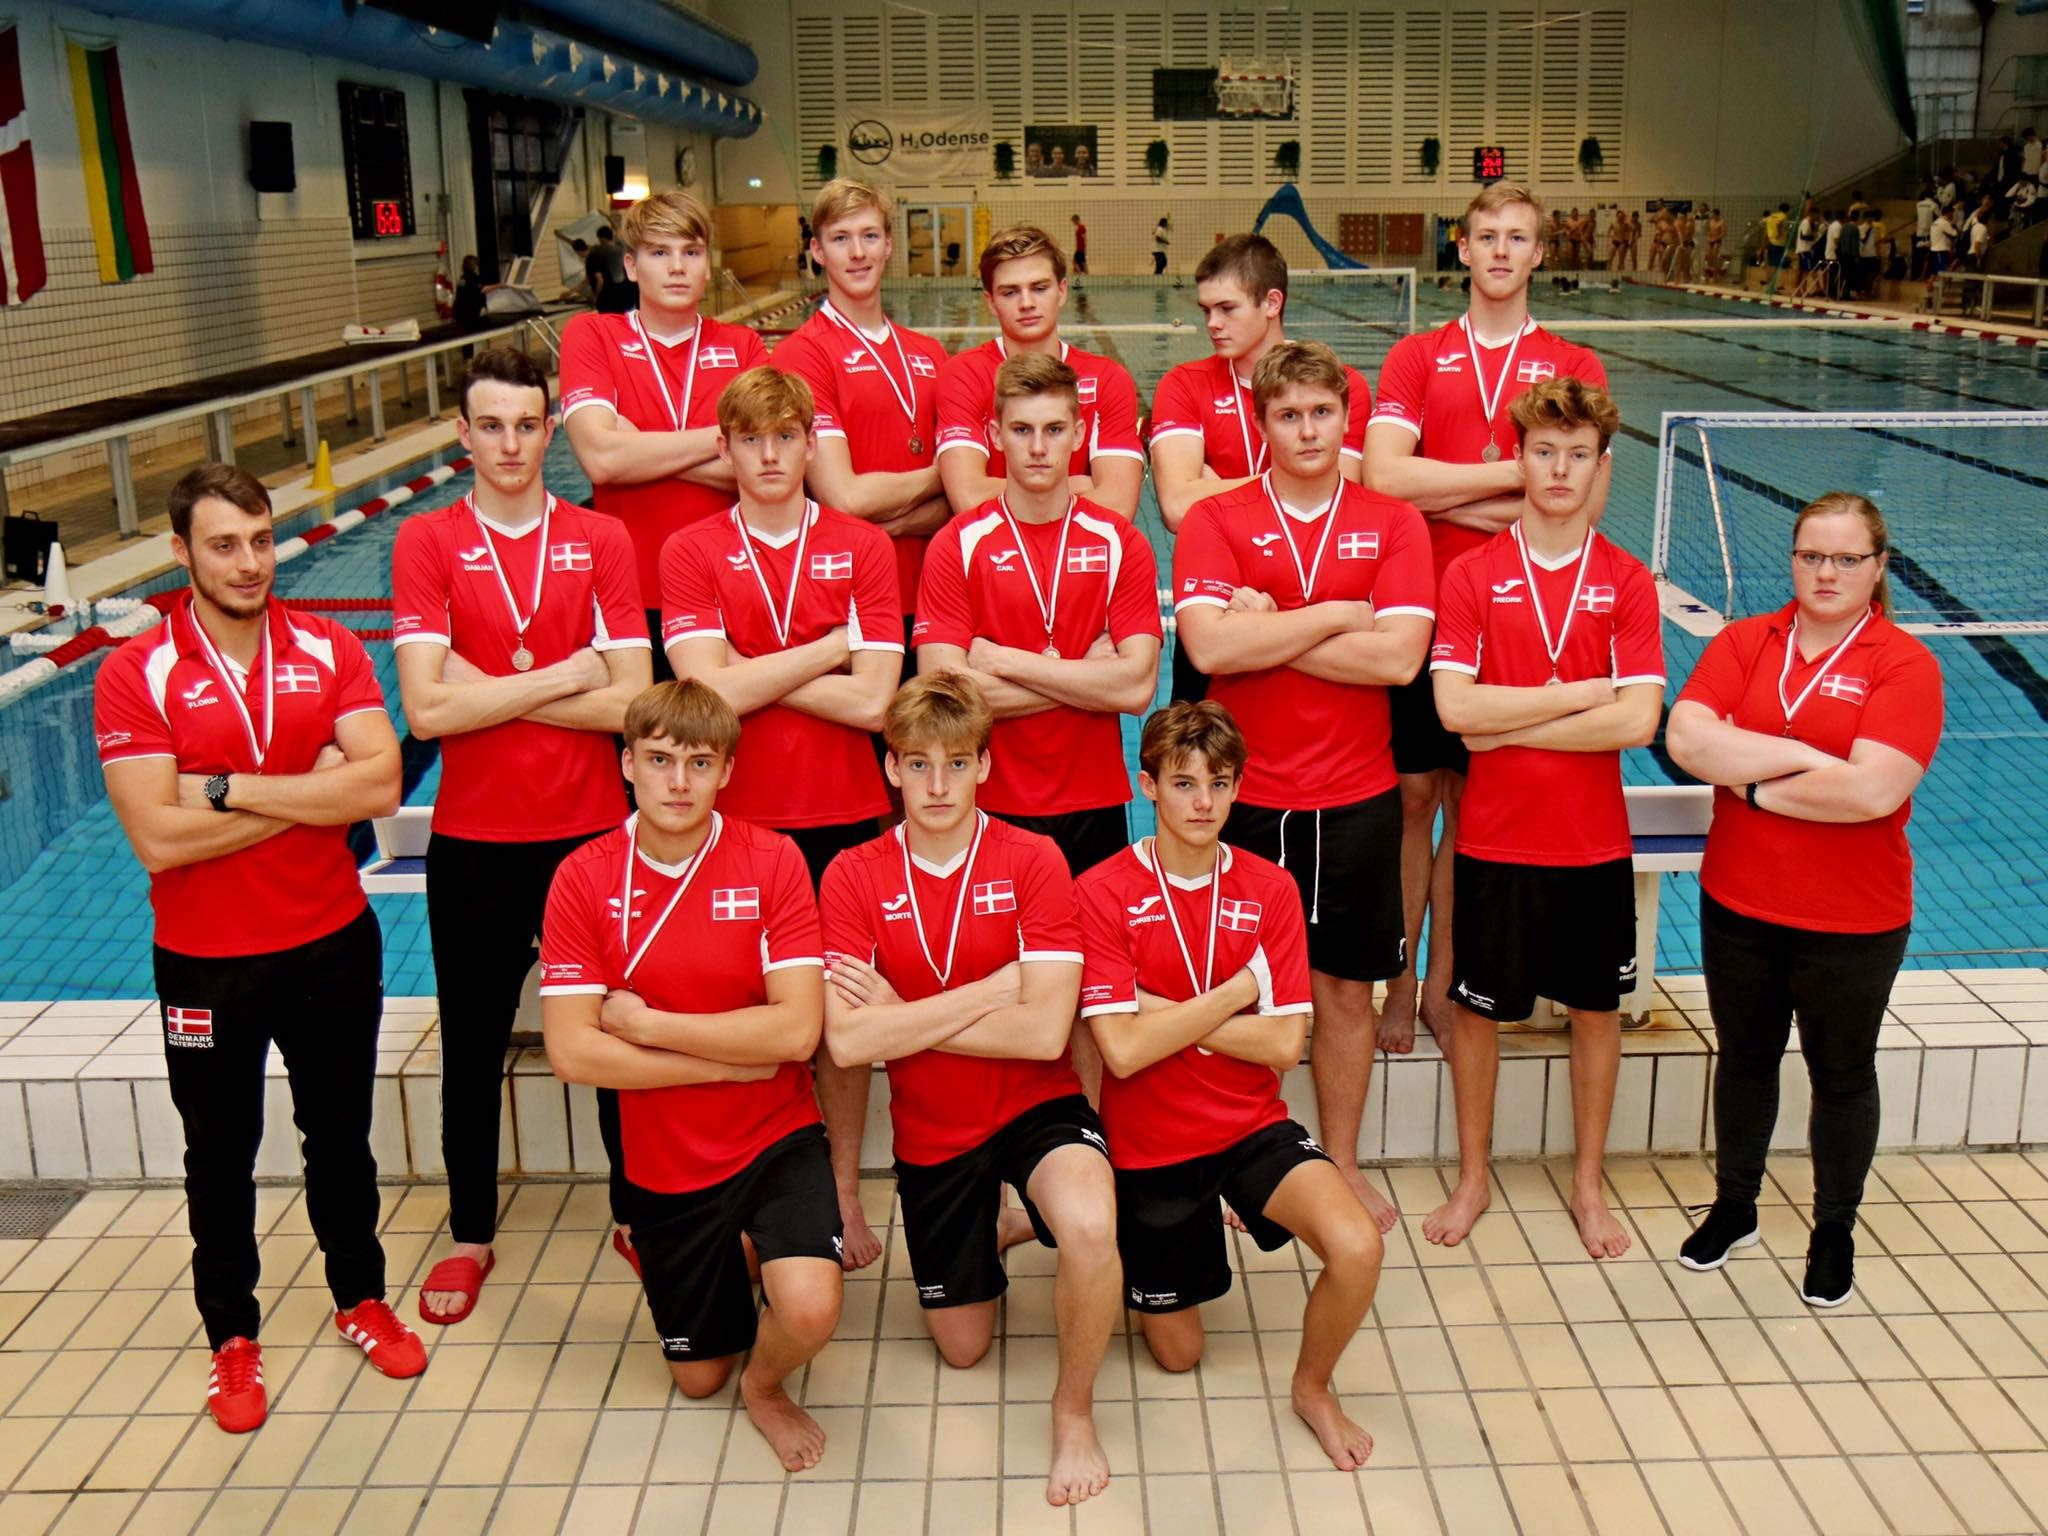 U17 landshold vandpolo drenge